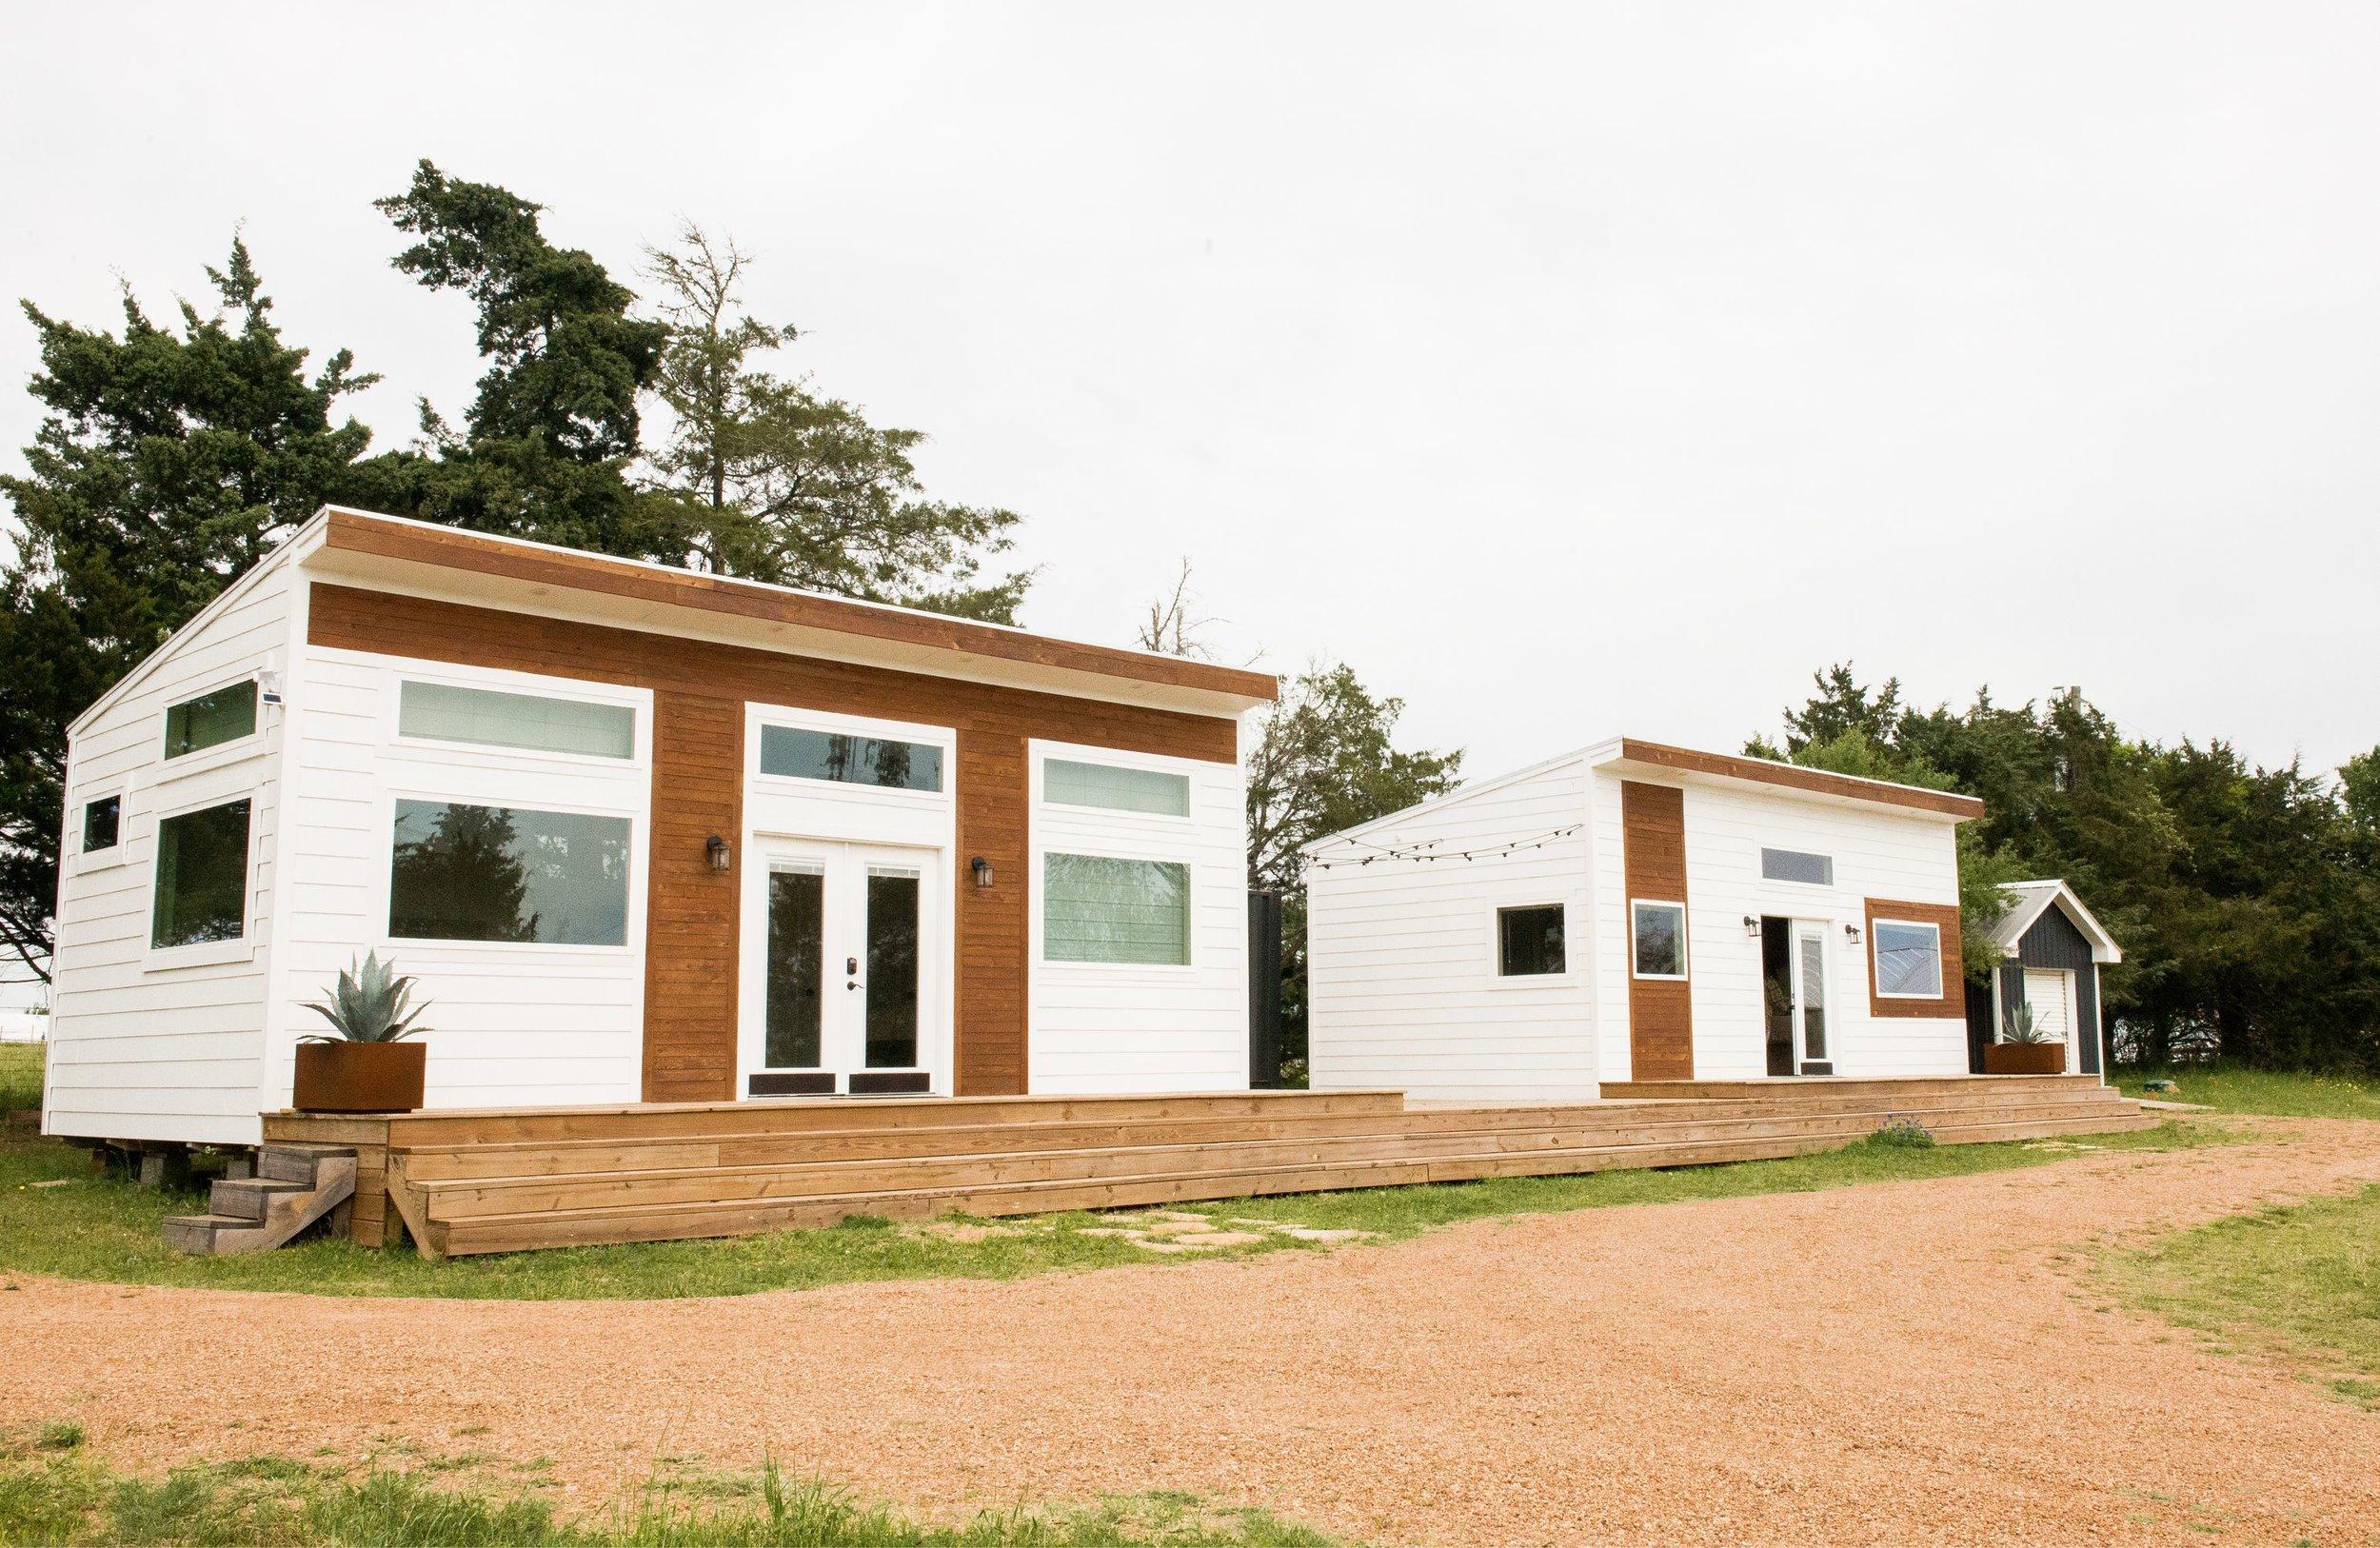 The Cozy Cottages.